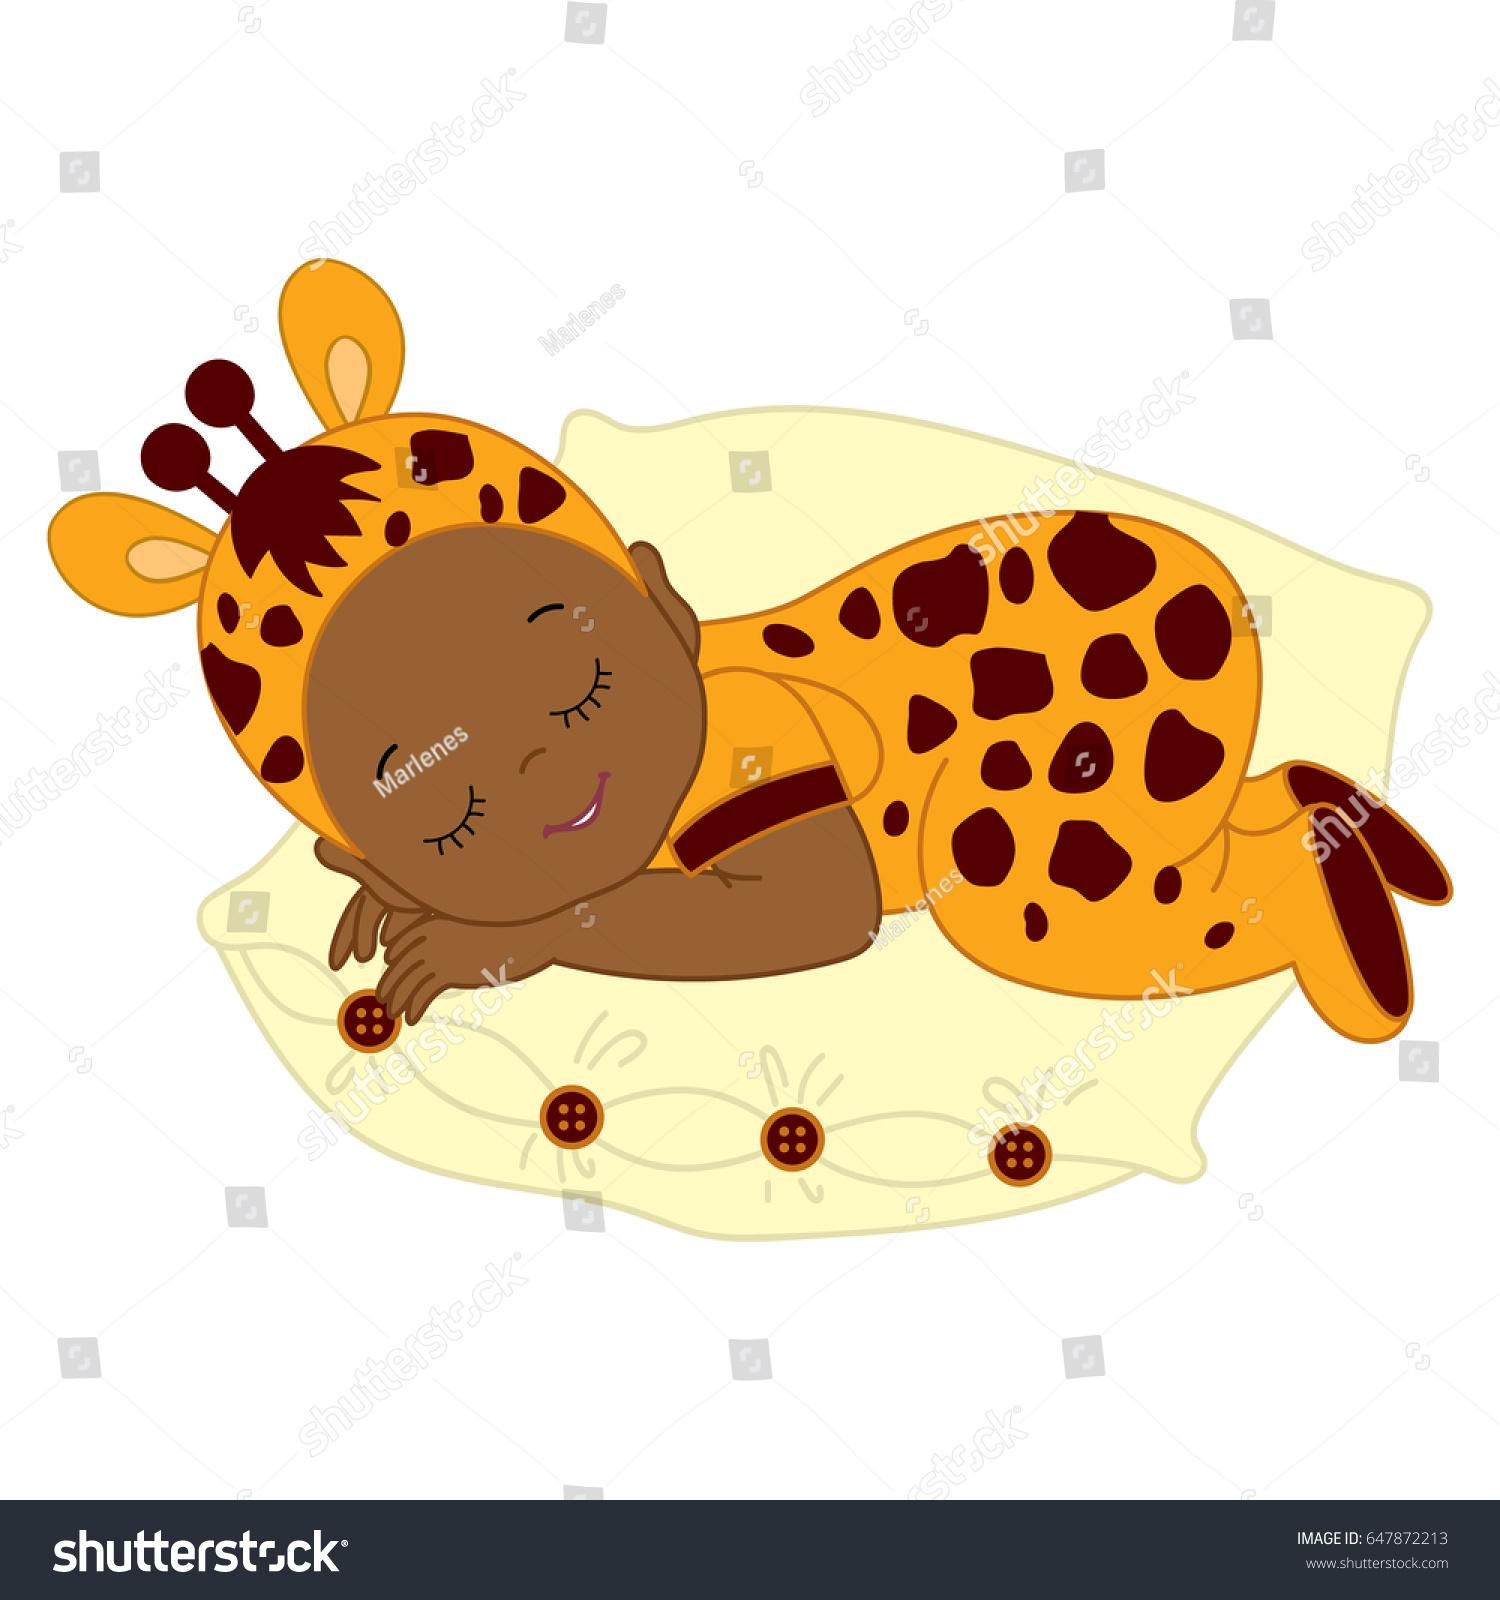 Vector African American cute baby in giraffe costume sleeping. Baby in giraffe outfit sleeping on  sc 1 st  Shutterstock & Vector African American Cute Baby Giraffe Stock Vector 647872213 ...